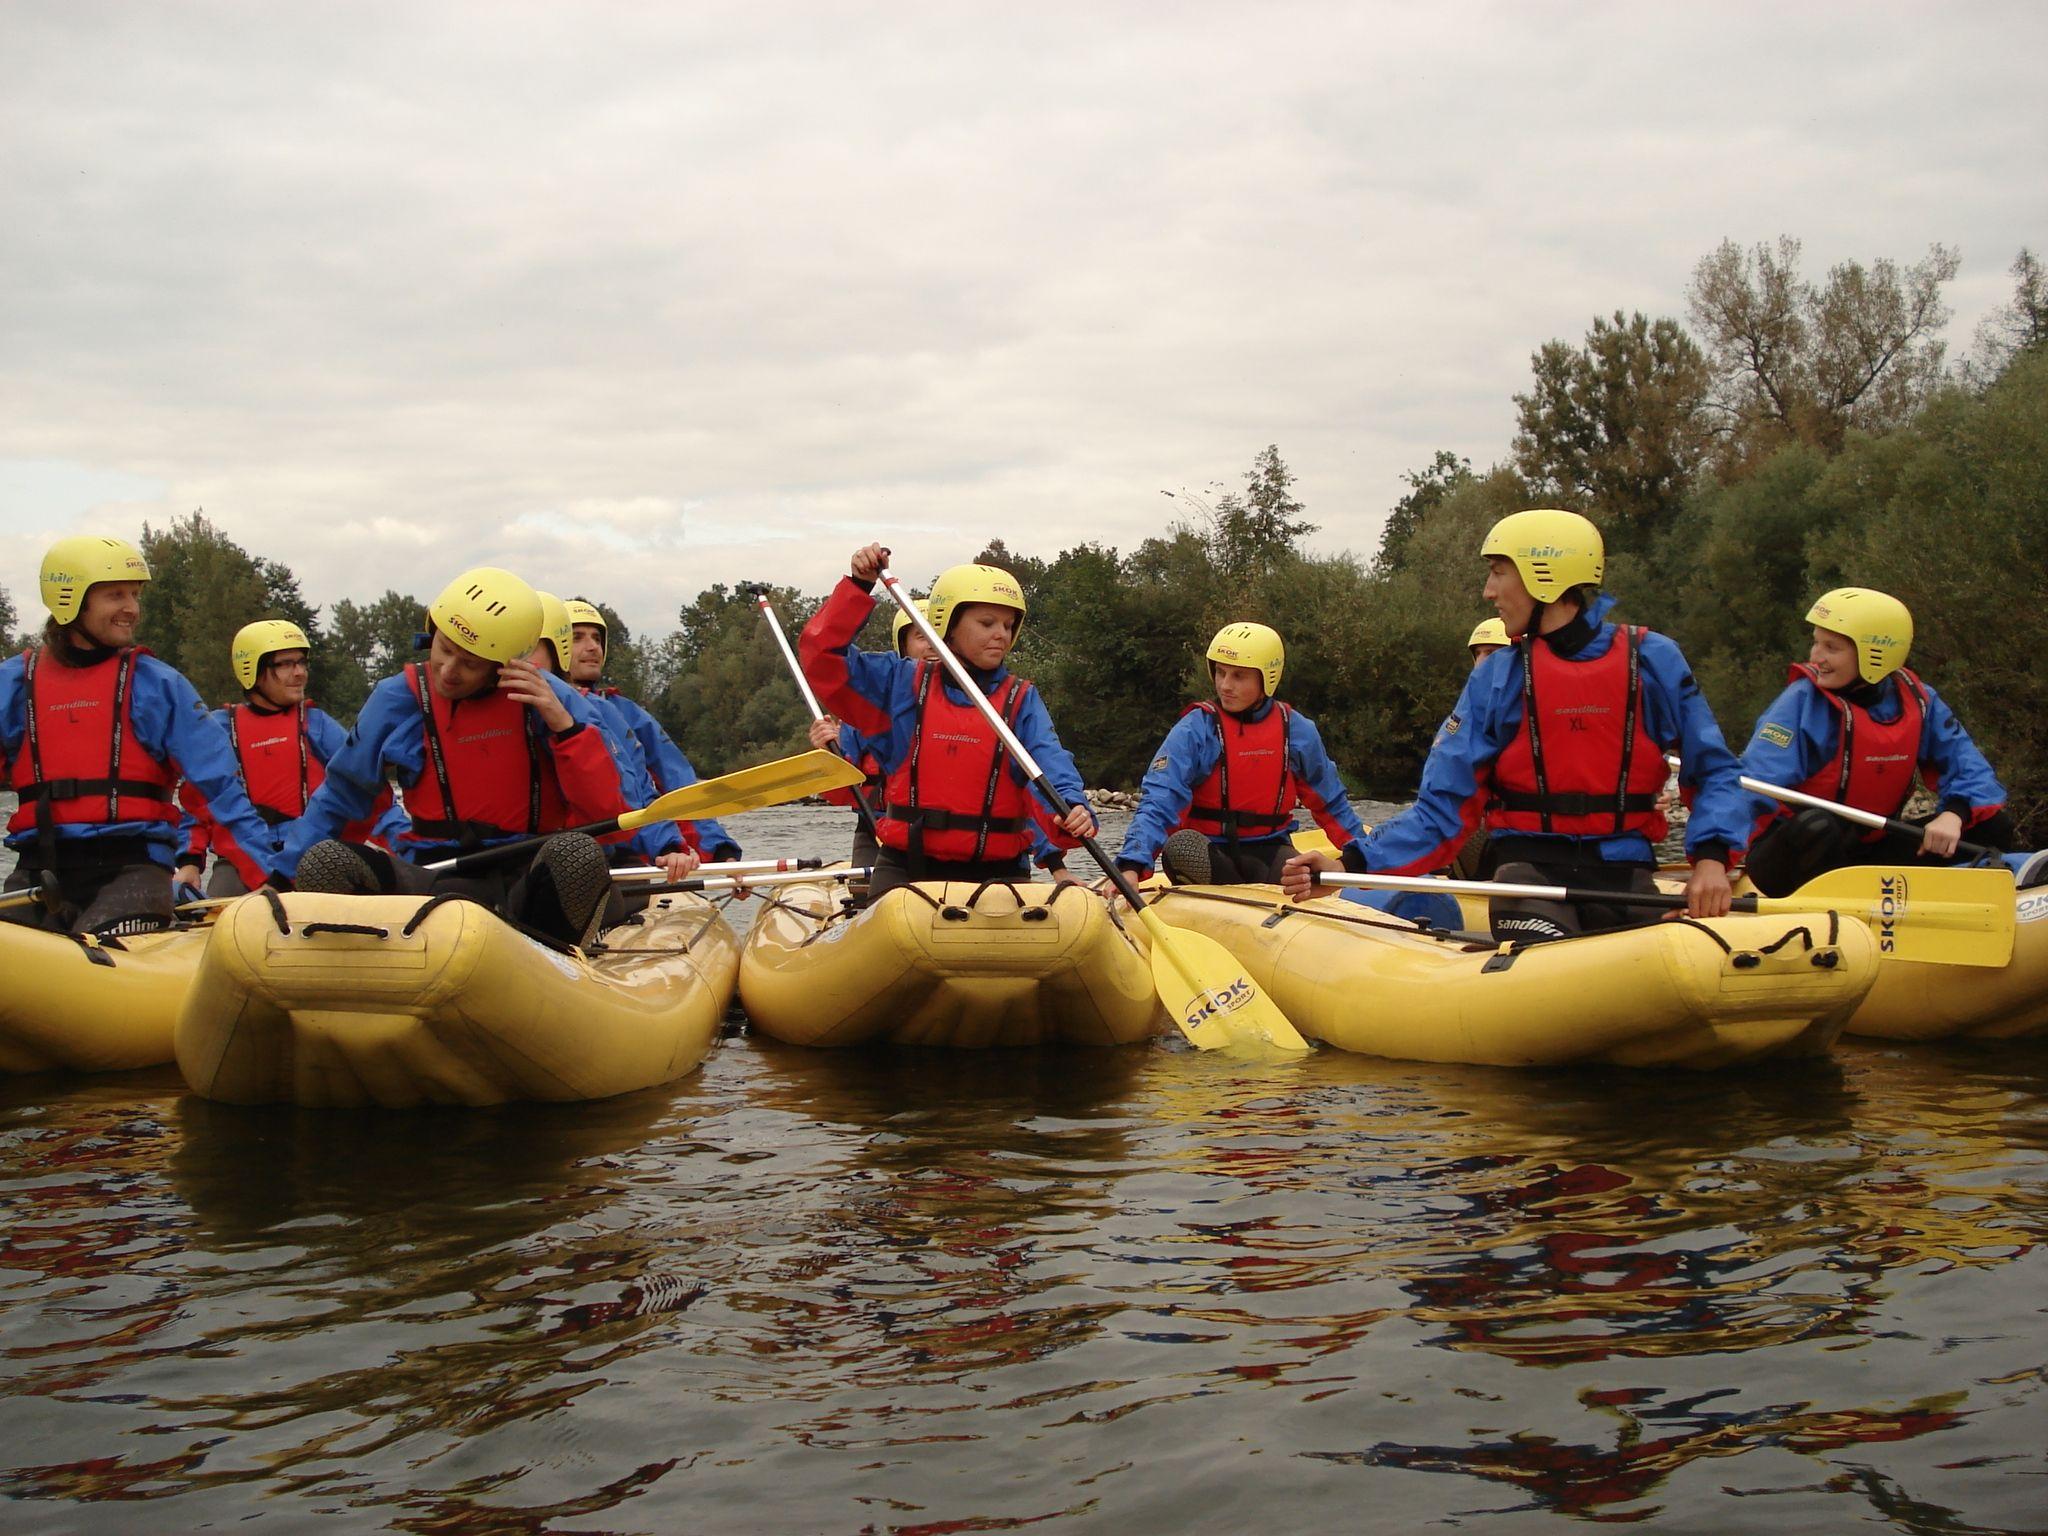 rafting, team, challenge, outdoor